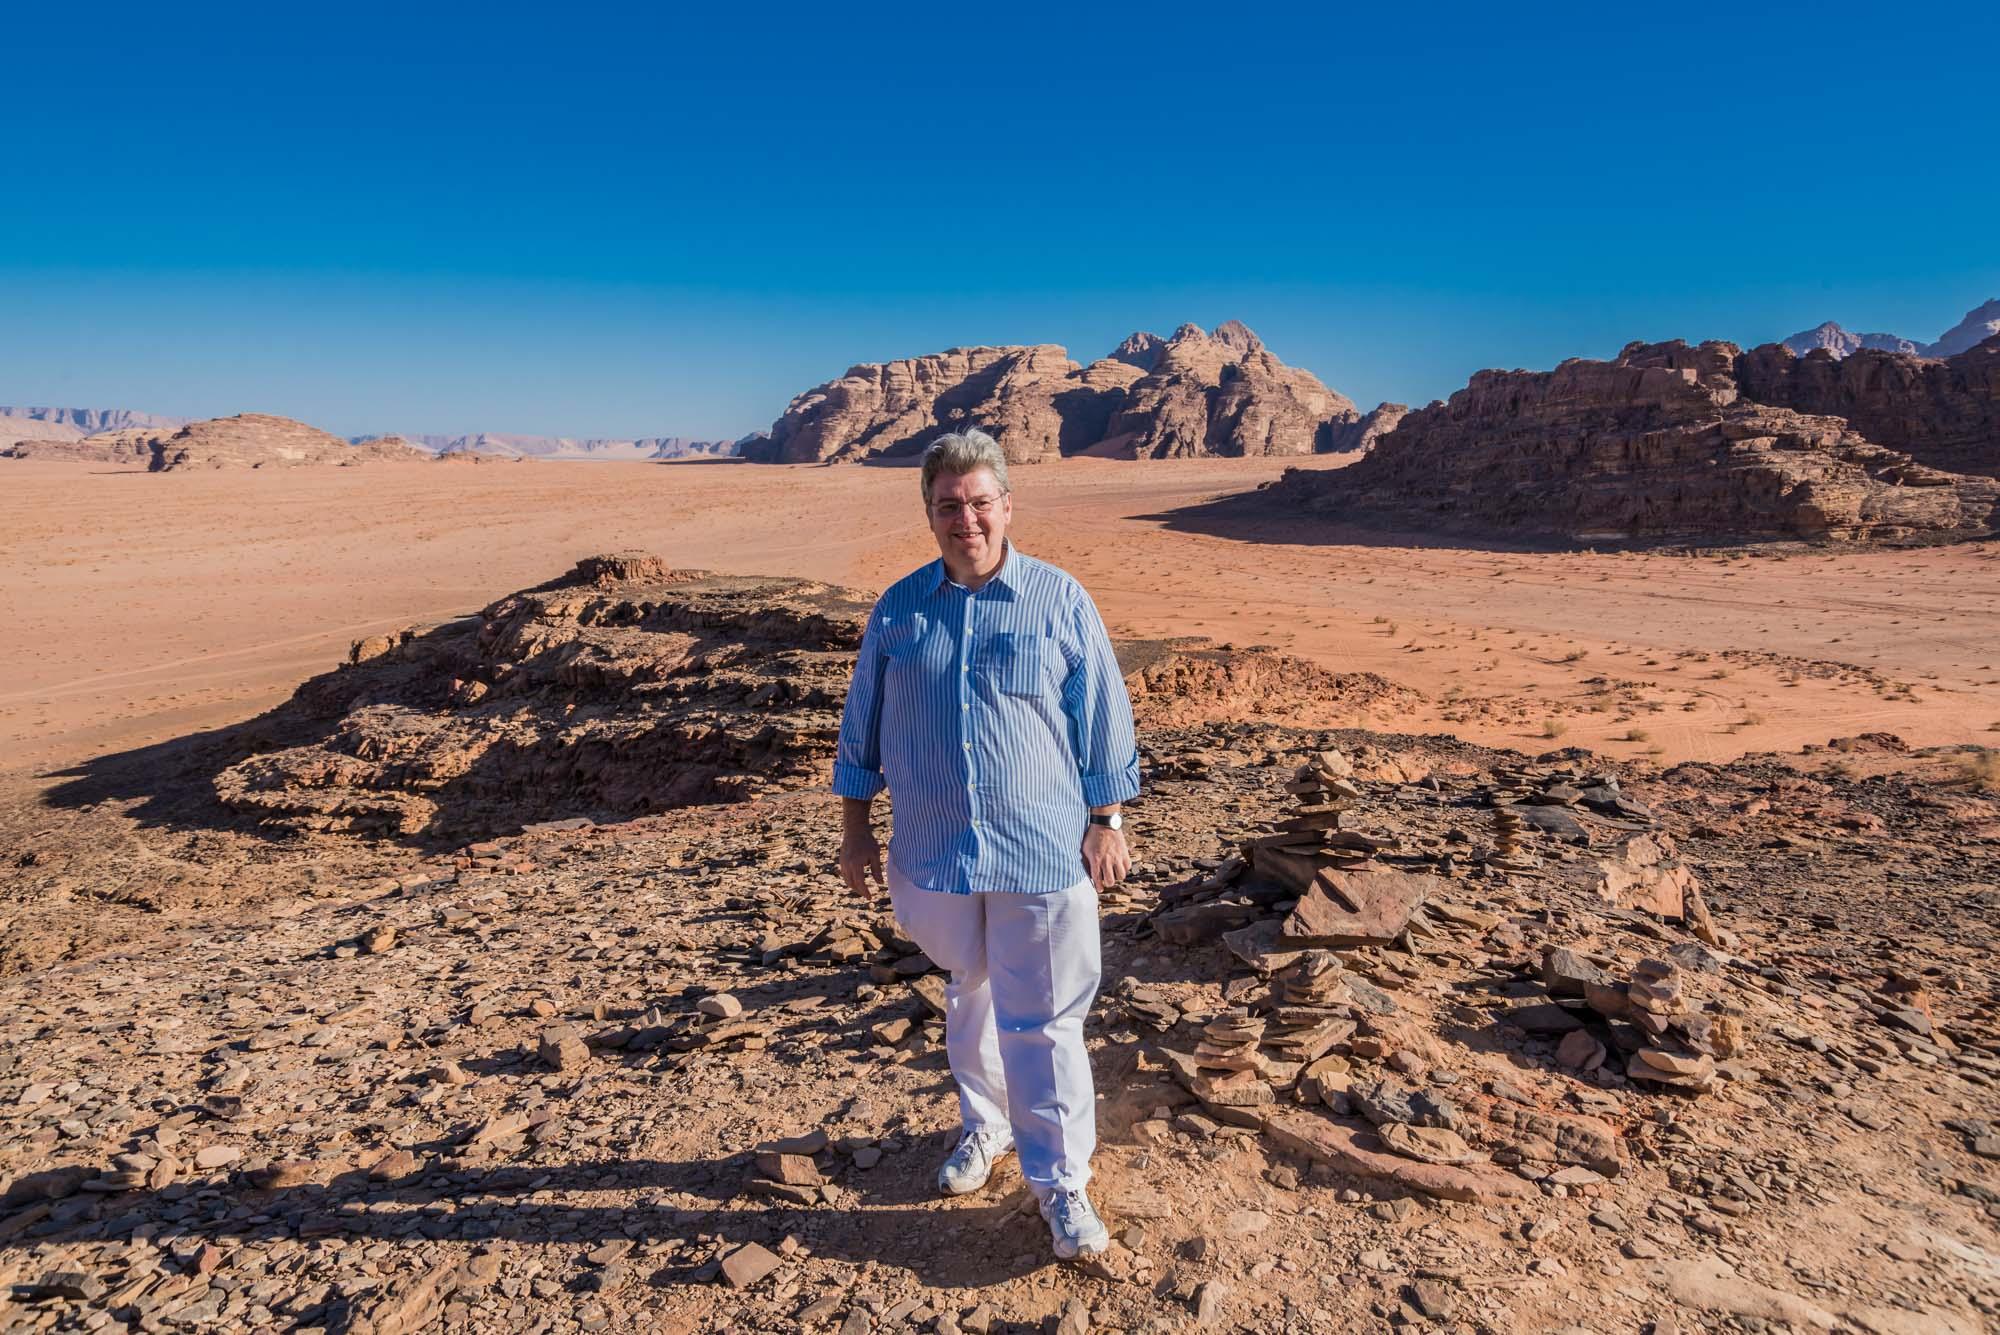 Peter Jurgilewitsch im Wadi Rum in Jordanien